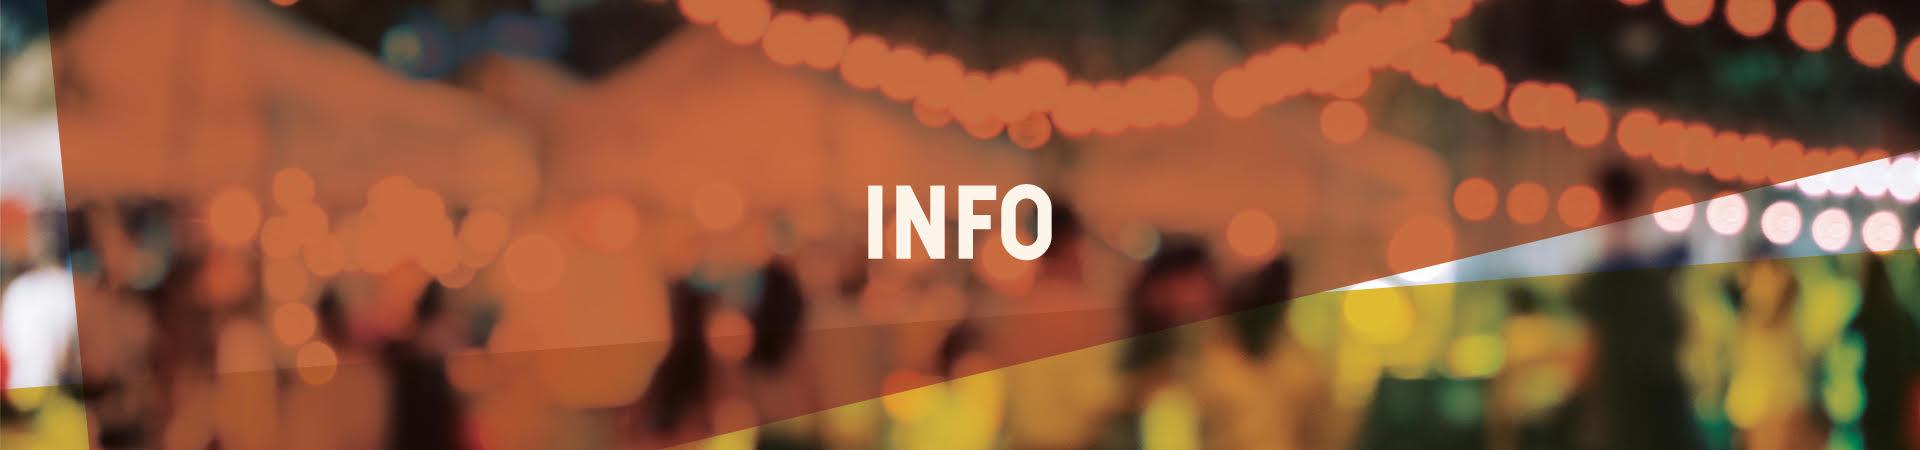 Info Web Banner